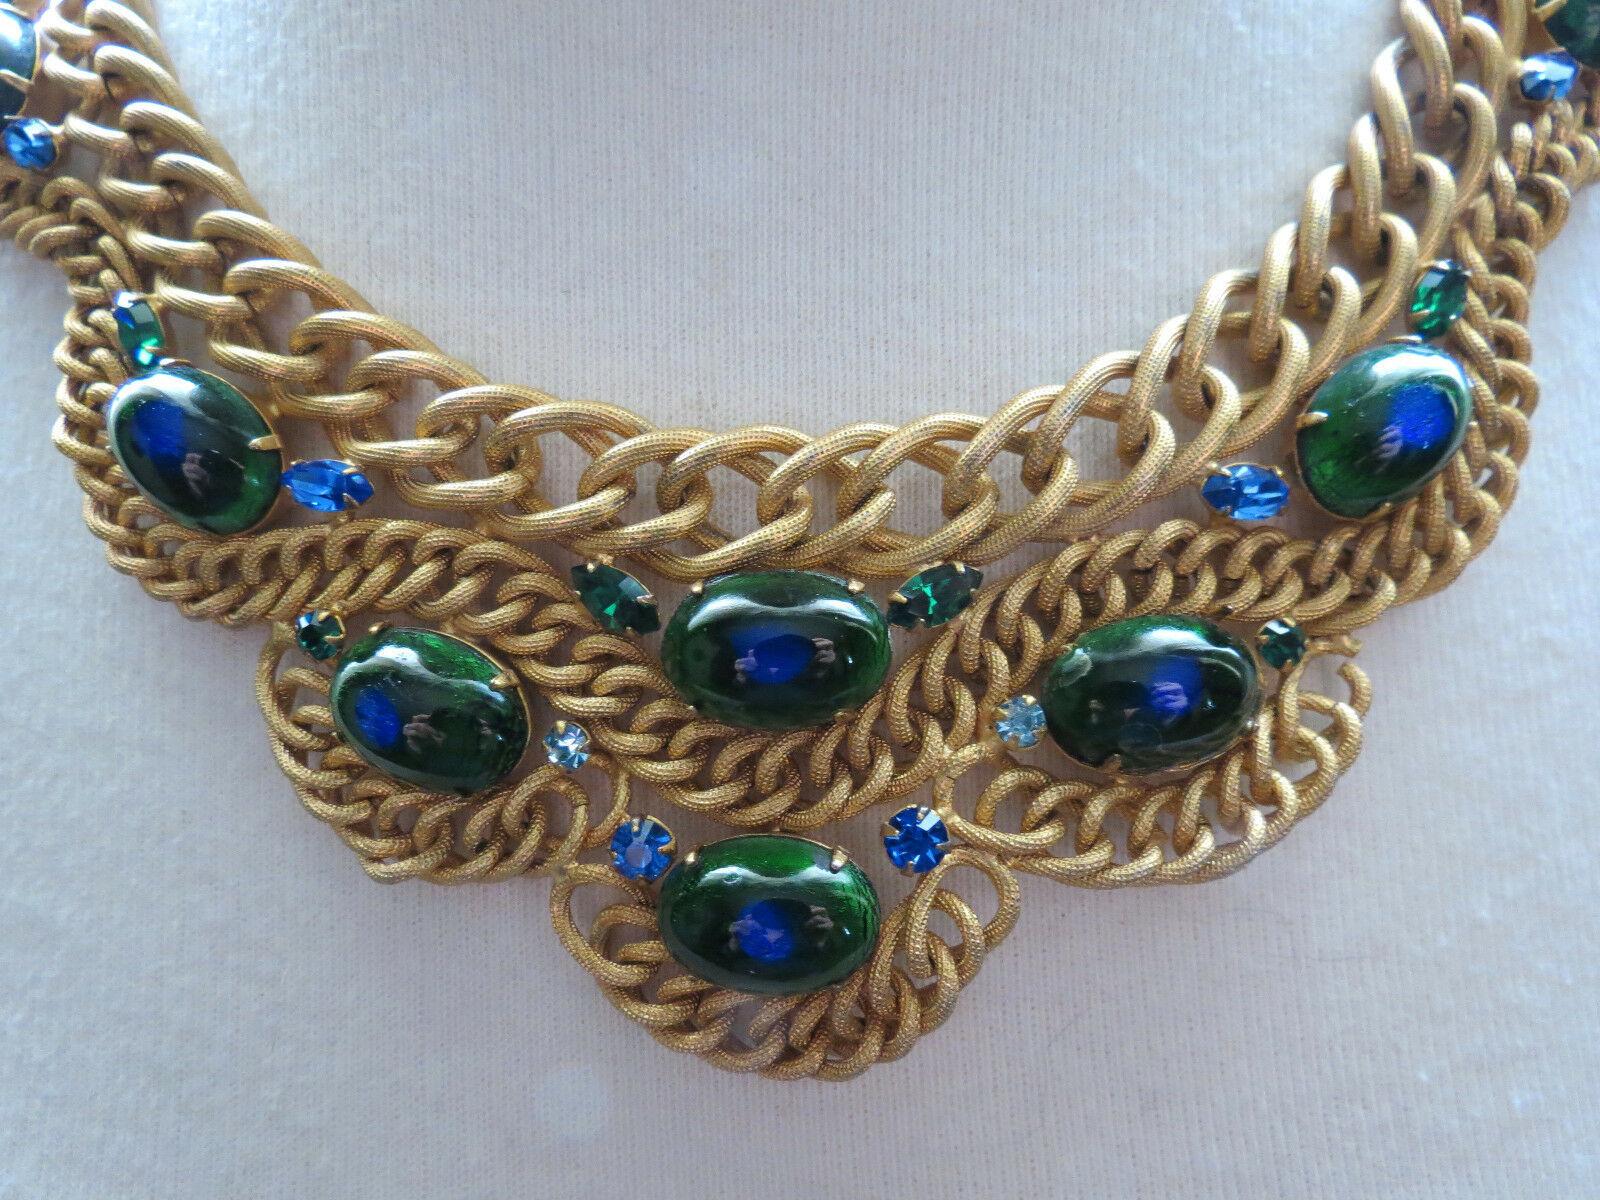 VTG Brania Bib Necklace Mimi Di N Collar Parue Blue Rhinestones Peacock Eye Cabs image 8